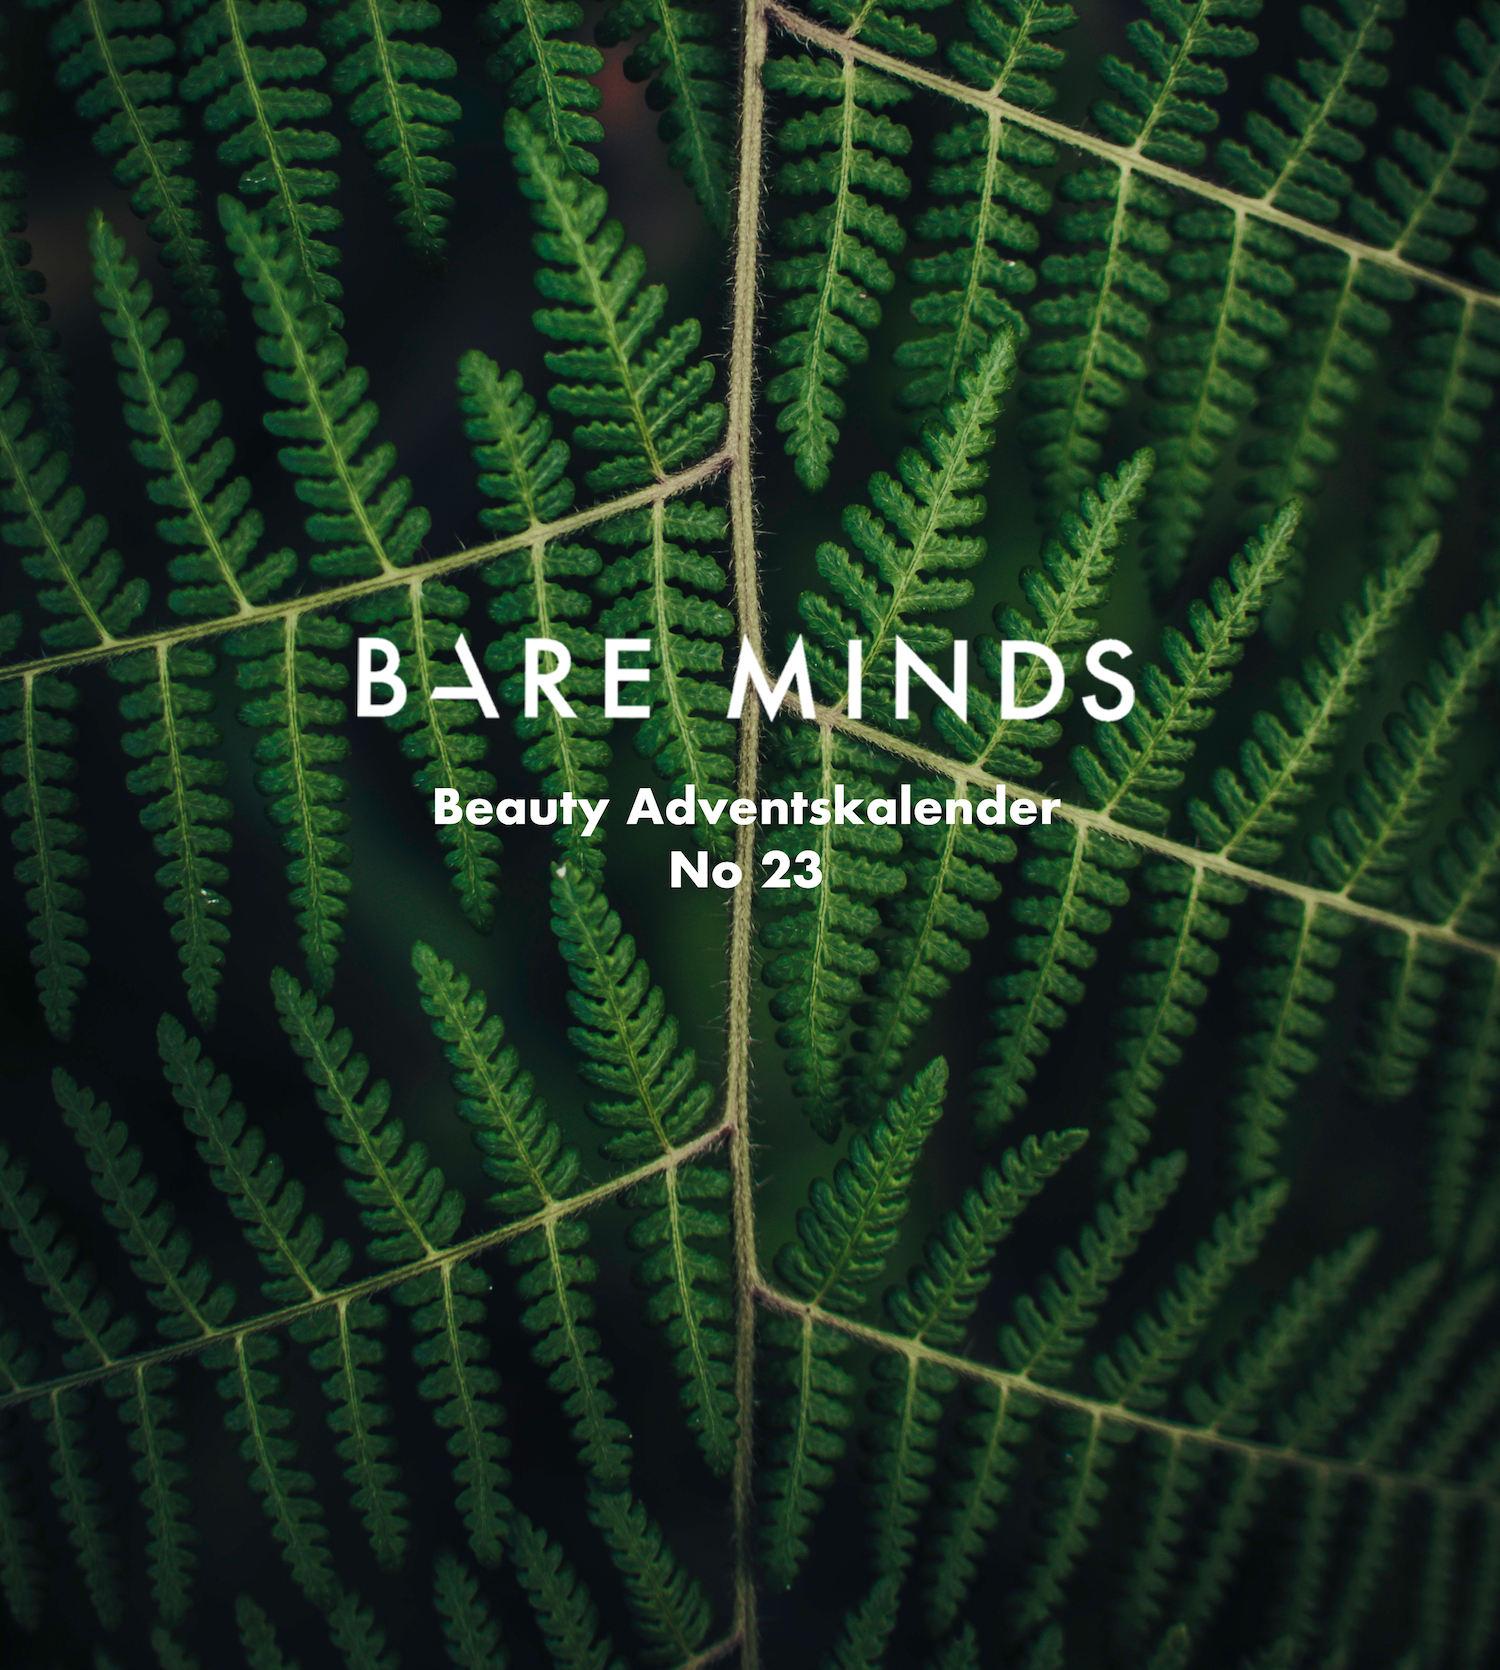 Beautyblog Beautyblogger BARE MINDS Elina Neumann Studio Botanic pandu-ior-199157